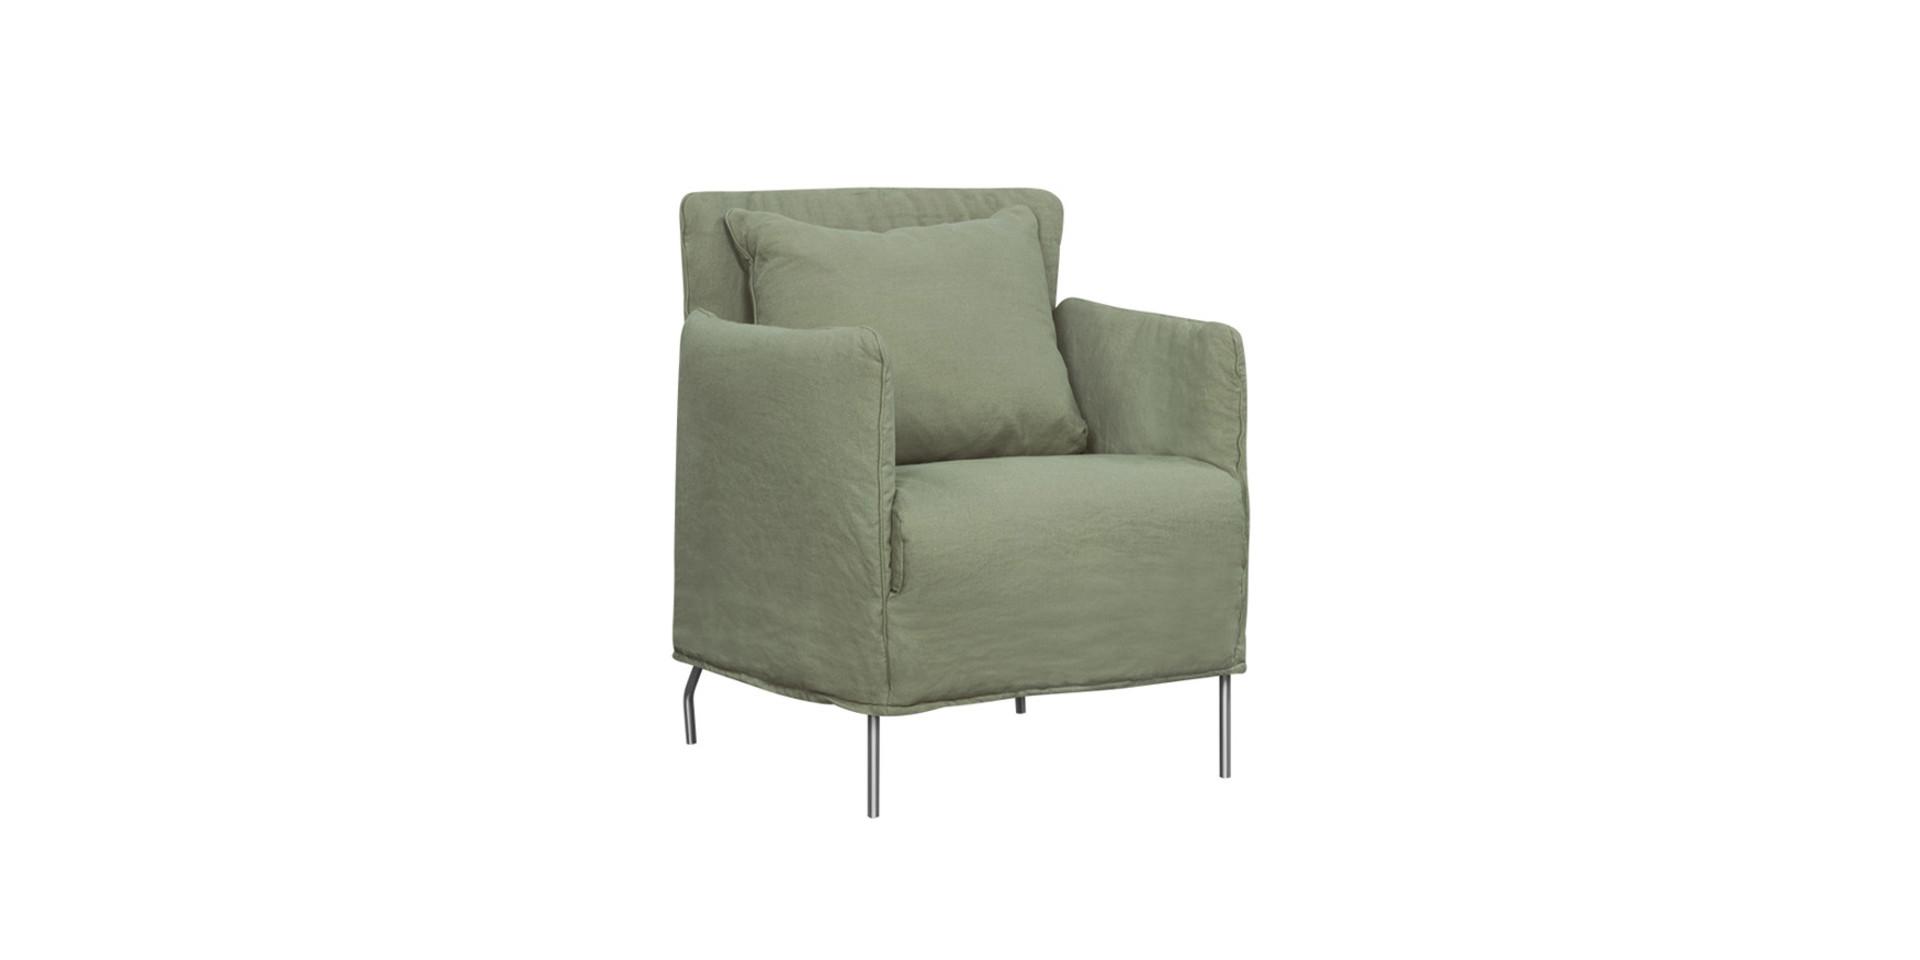 CUTE_armchair_linenP823_9_sage_2